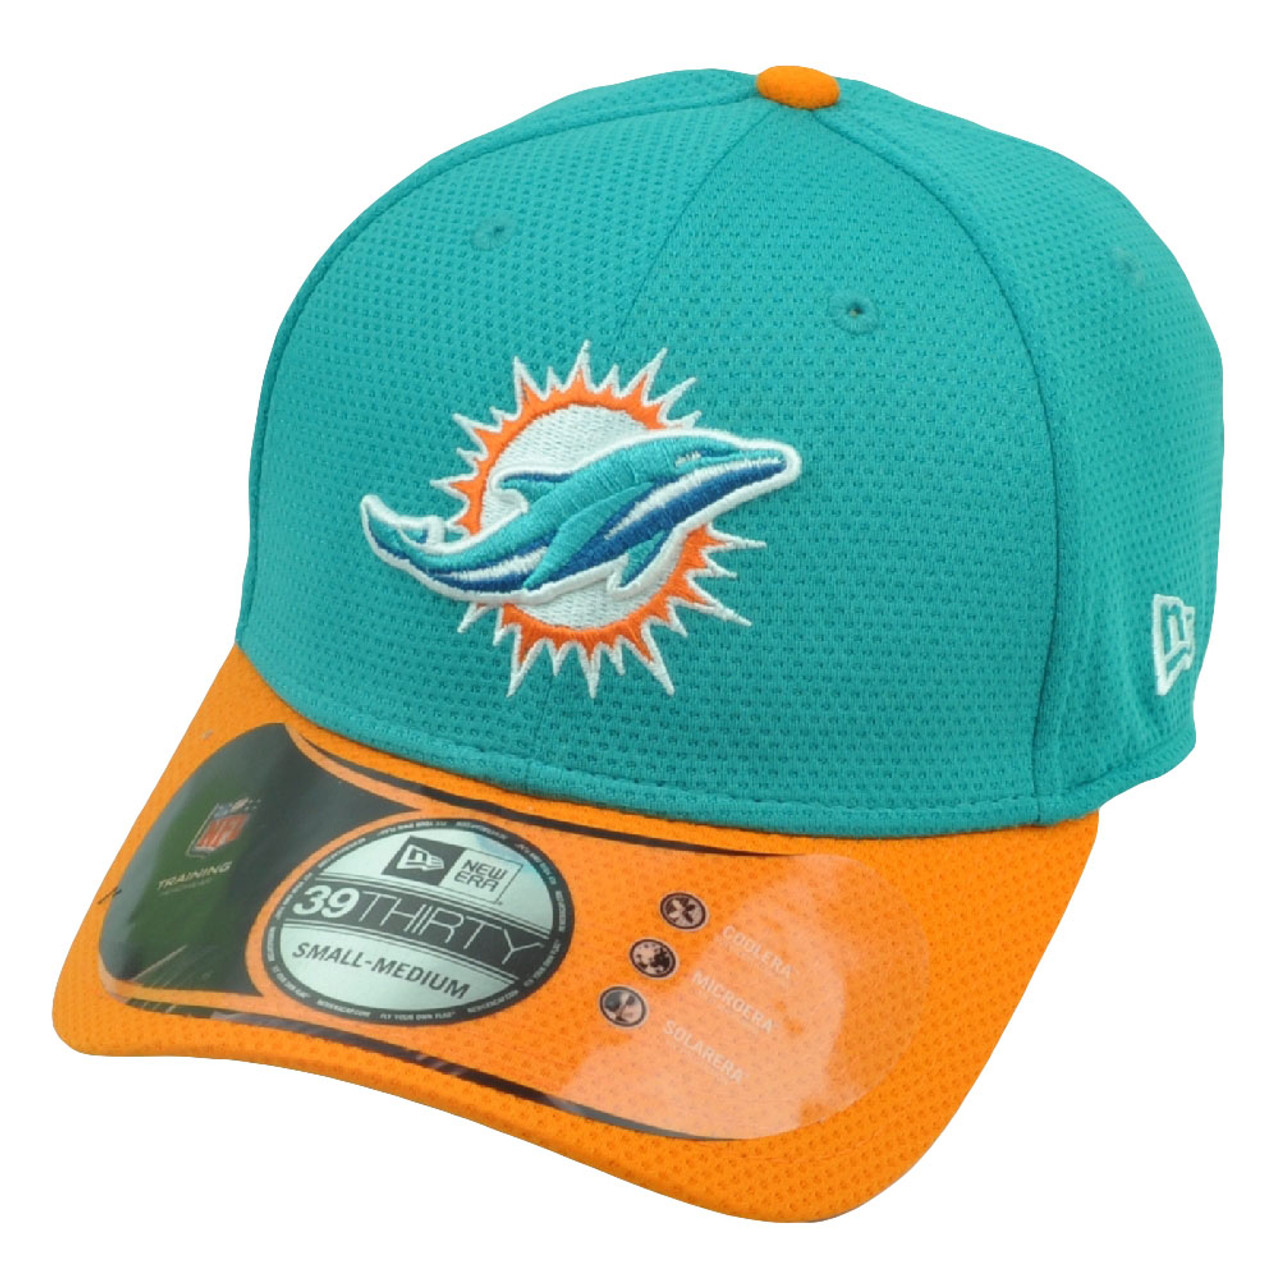 huge discount 1b2c7 b409f NFL New Era 3930 Miami Dolphins Flex Fit Medium Large 2015 Training Hat Cap  Teal